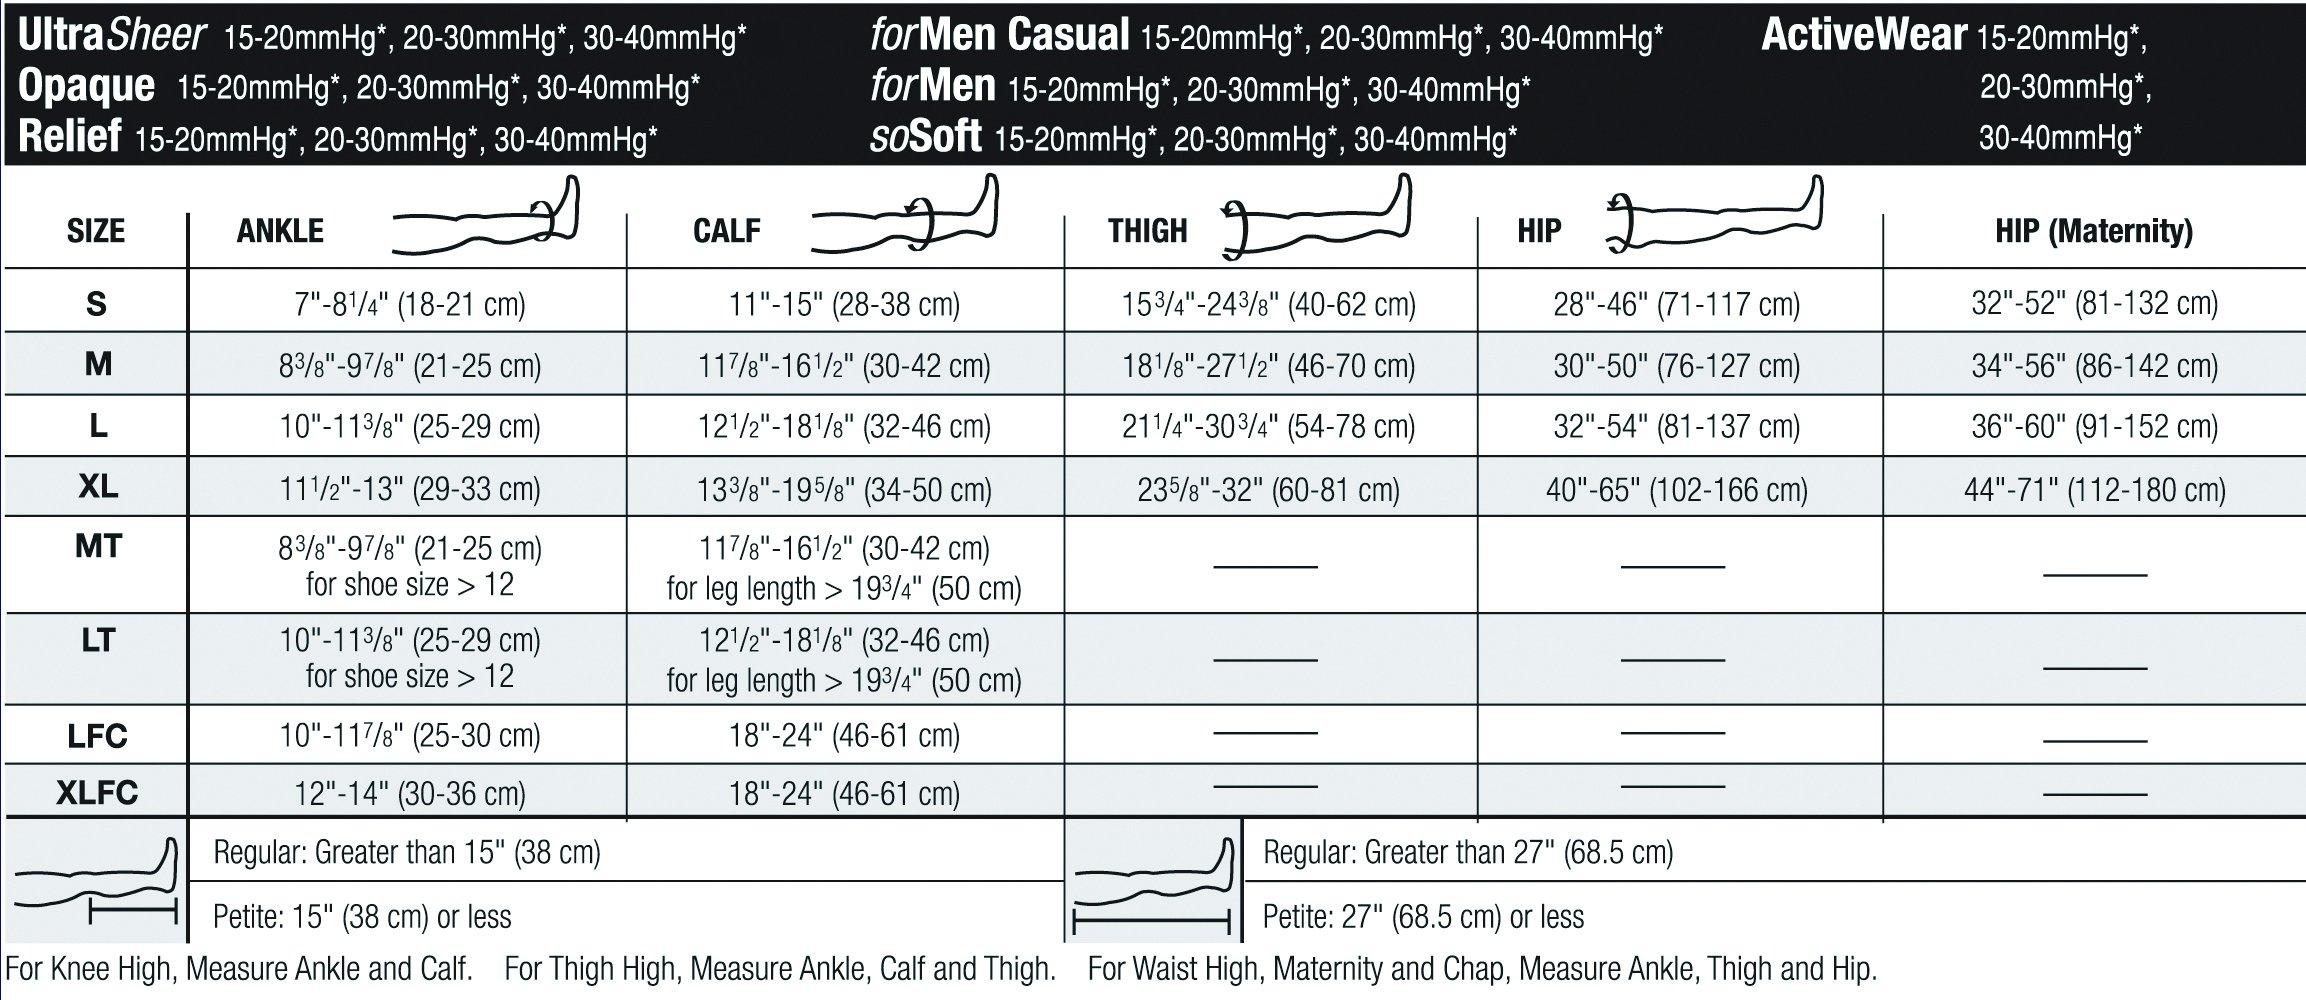 JOBST Activewear Compression Socks, 15-20 mmHg, Knee High, Medium, White by JOBST